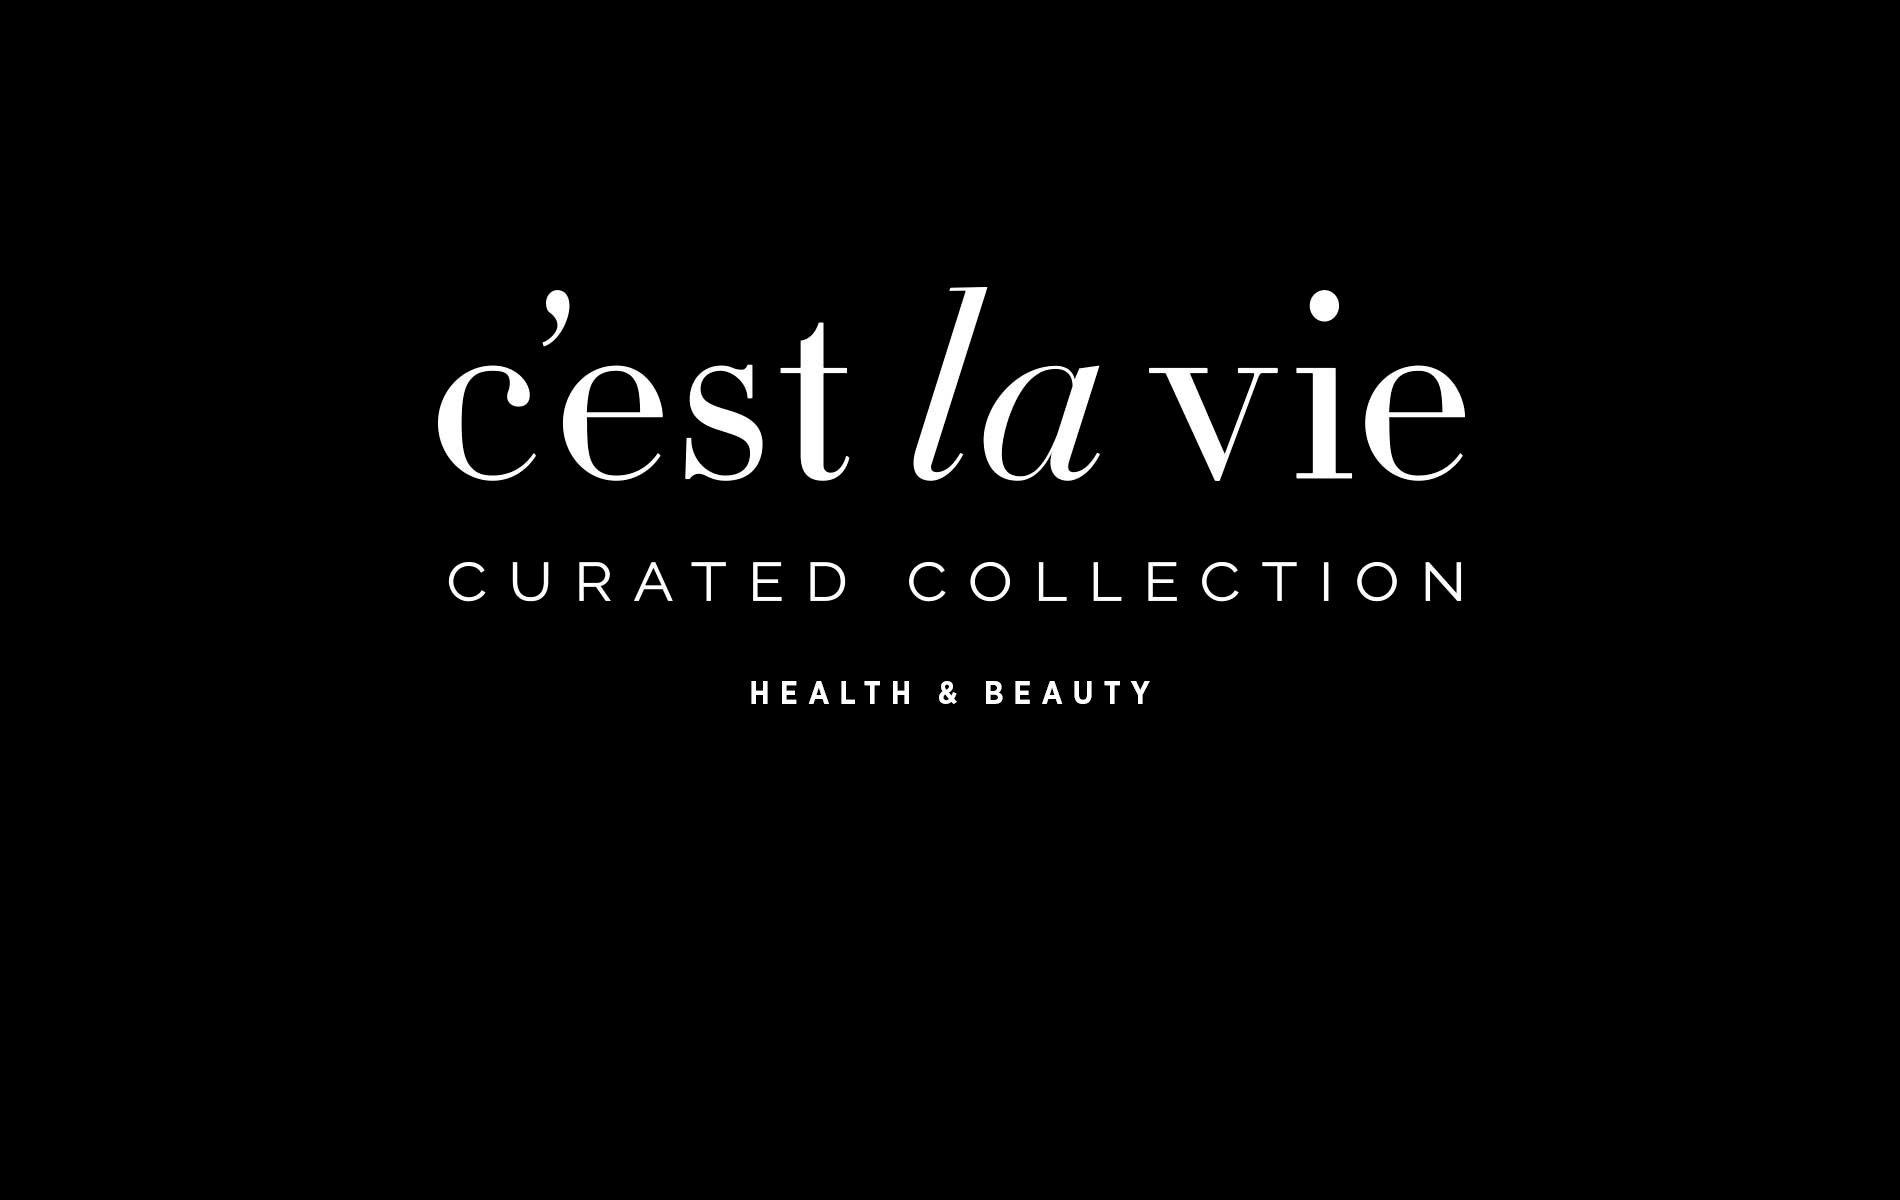 c'est la vie health and beauty VIE Magazine january 2017 luxury products